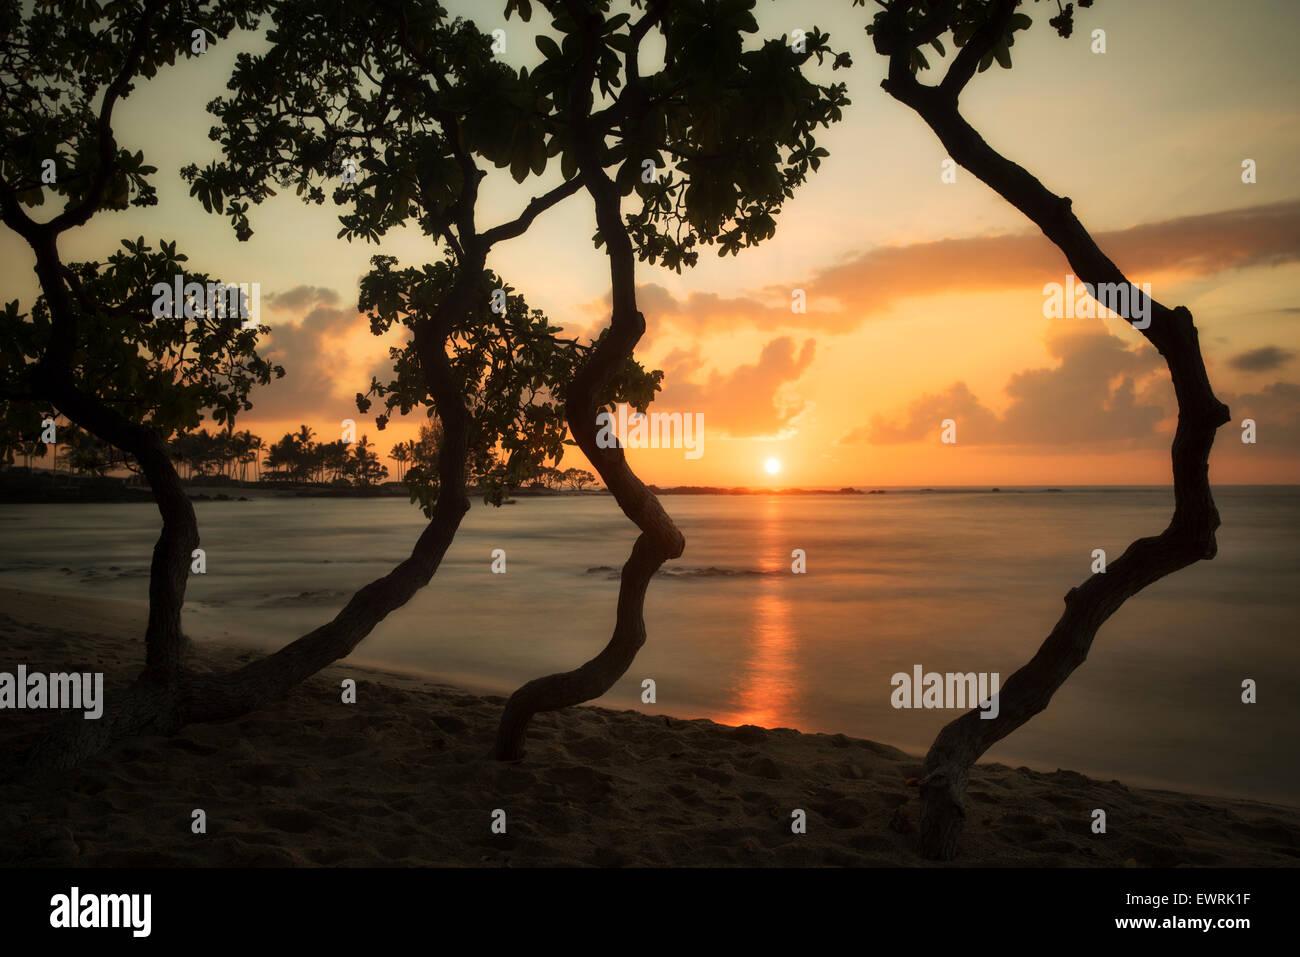 Sonnenuntergang über Bäume an der Kohala Küste. Hawaii, Big Island. Stockbild